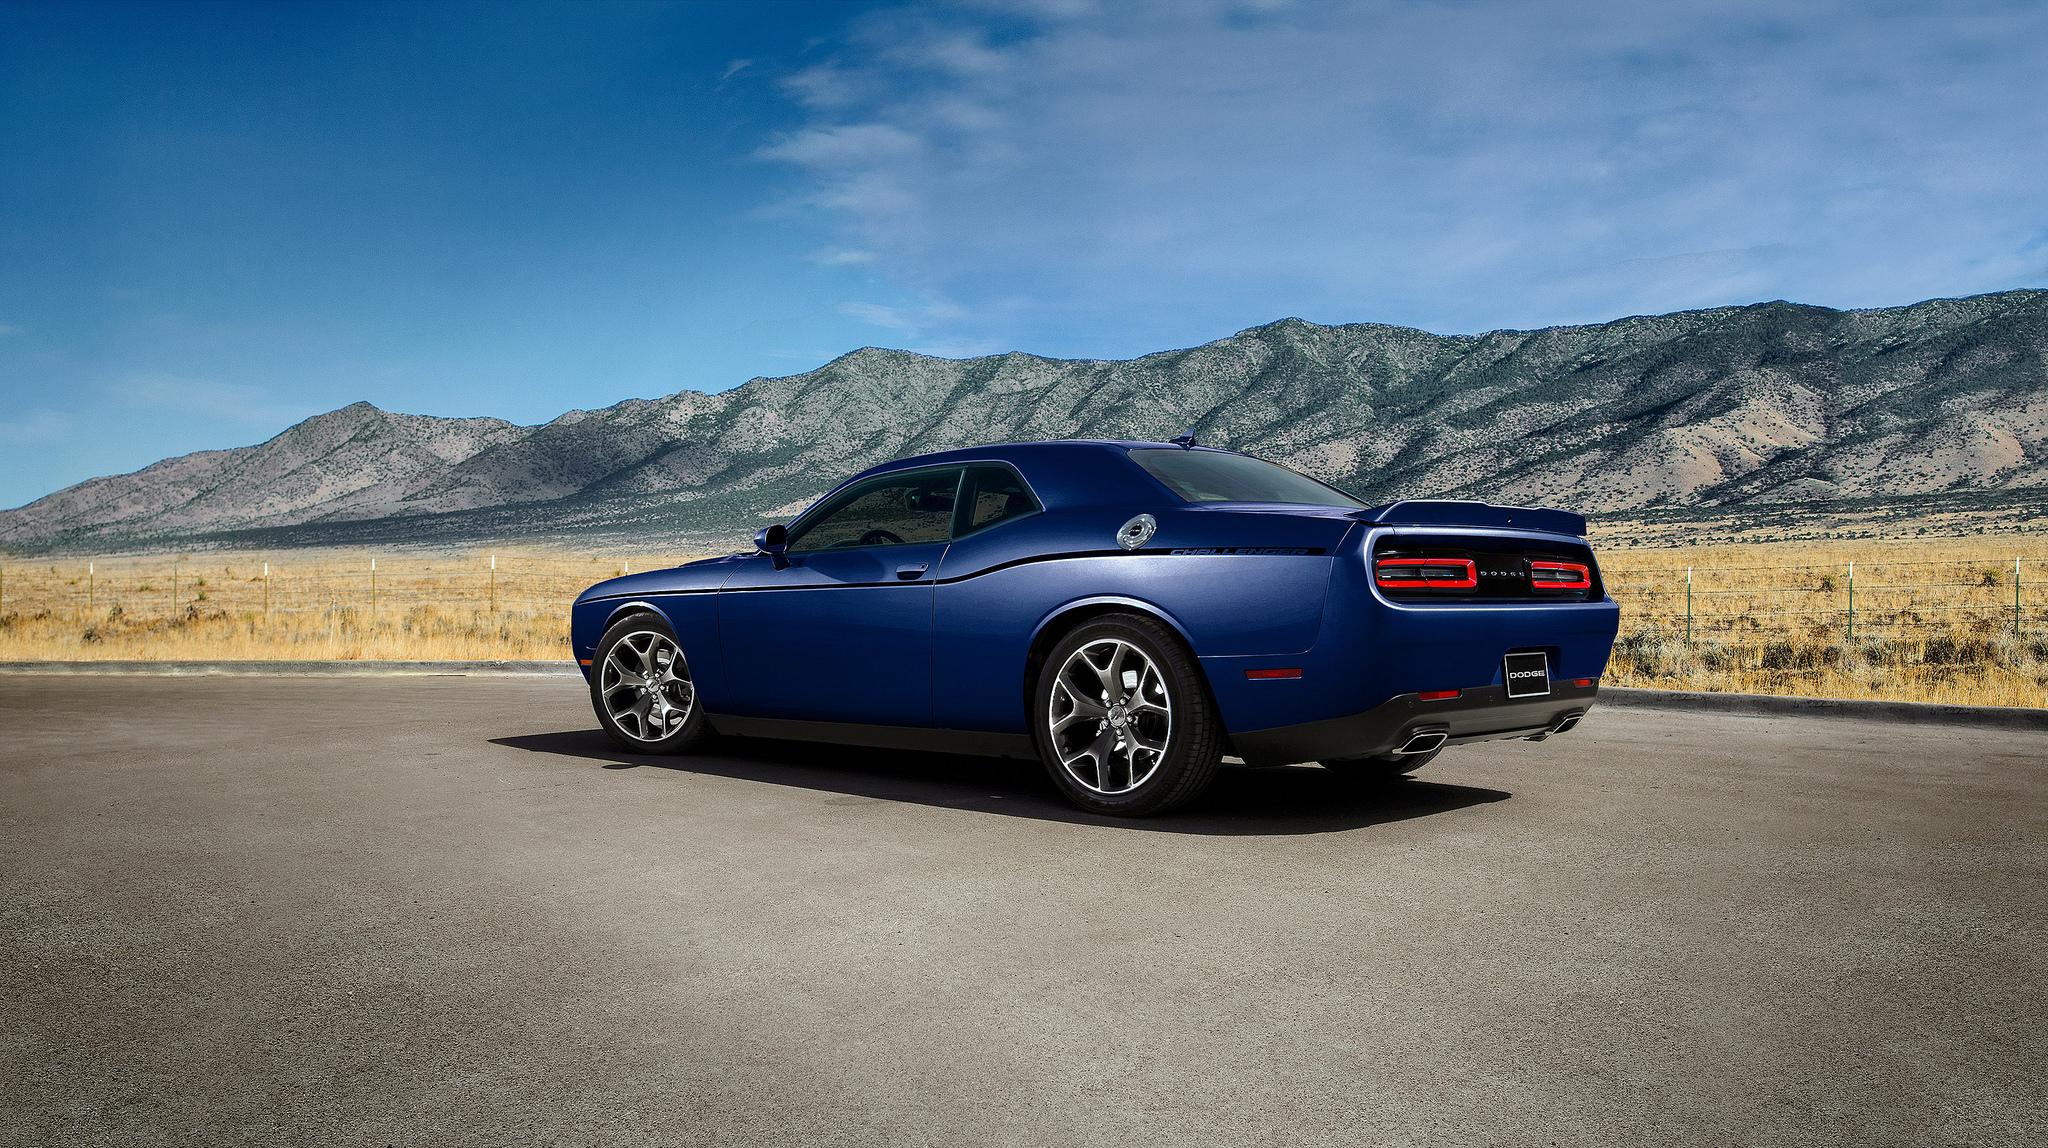 2018 Dodge Challenger SXT Delivers Sporty Performance ...